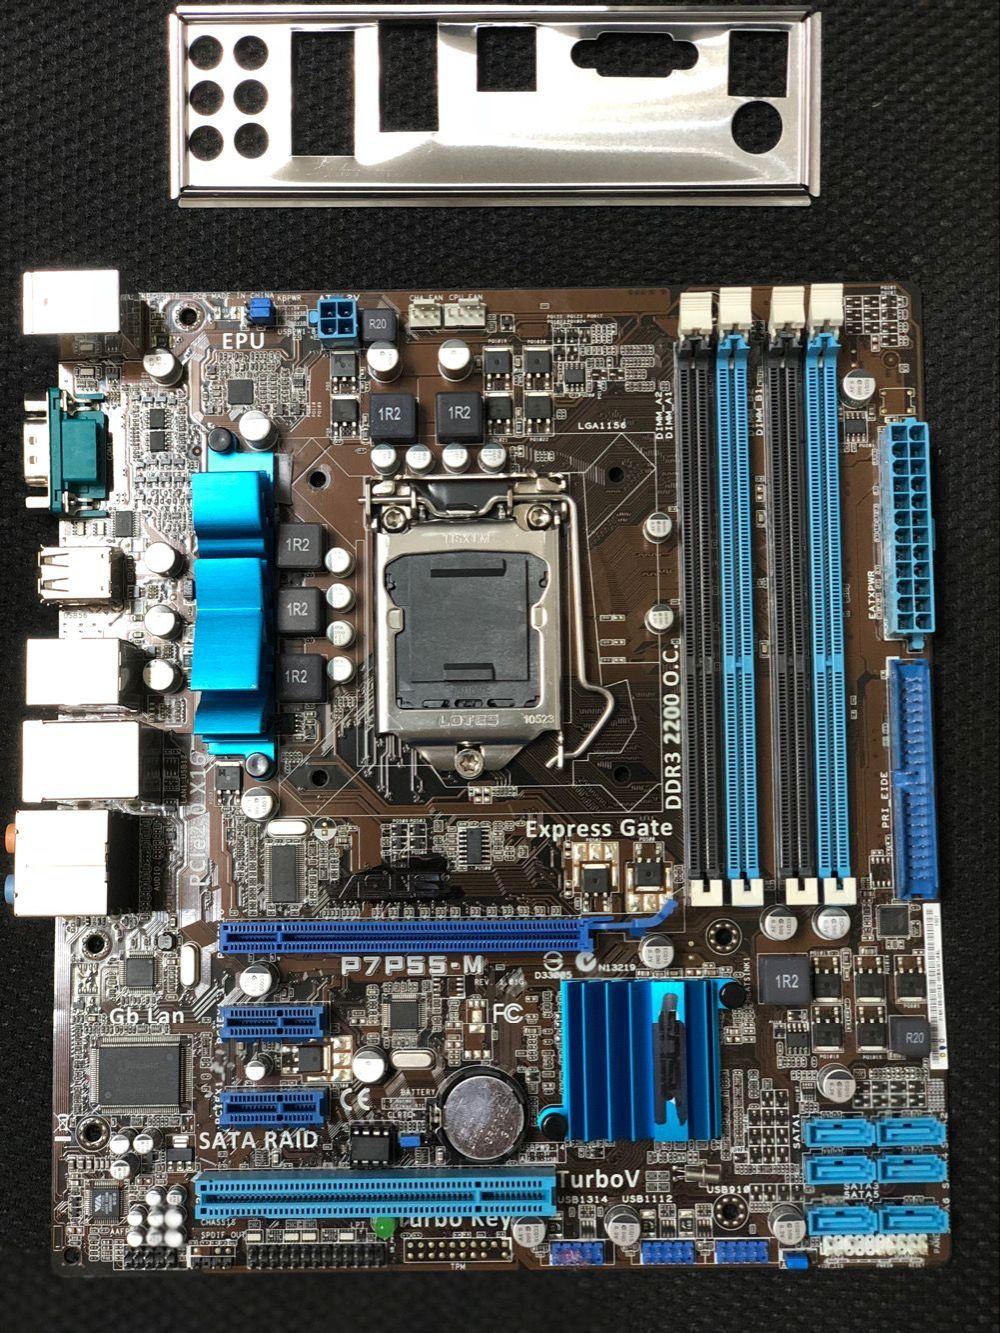 original motherboard for ASUS P7P55-M DDR3 LGA 1156 USB2.0 for I5 I7 cpu 16GB SATA2 P55 Desktop motherborad Free shipping